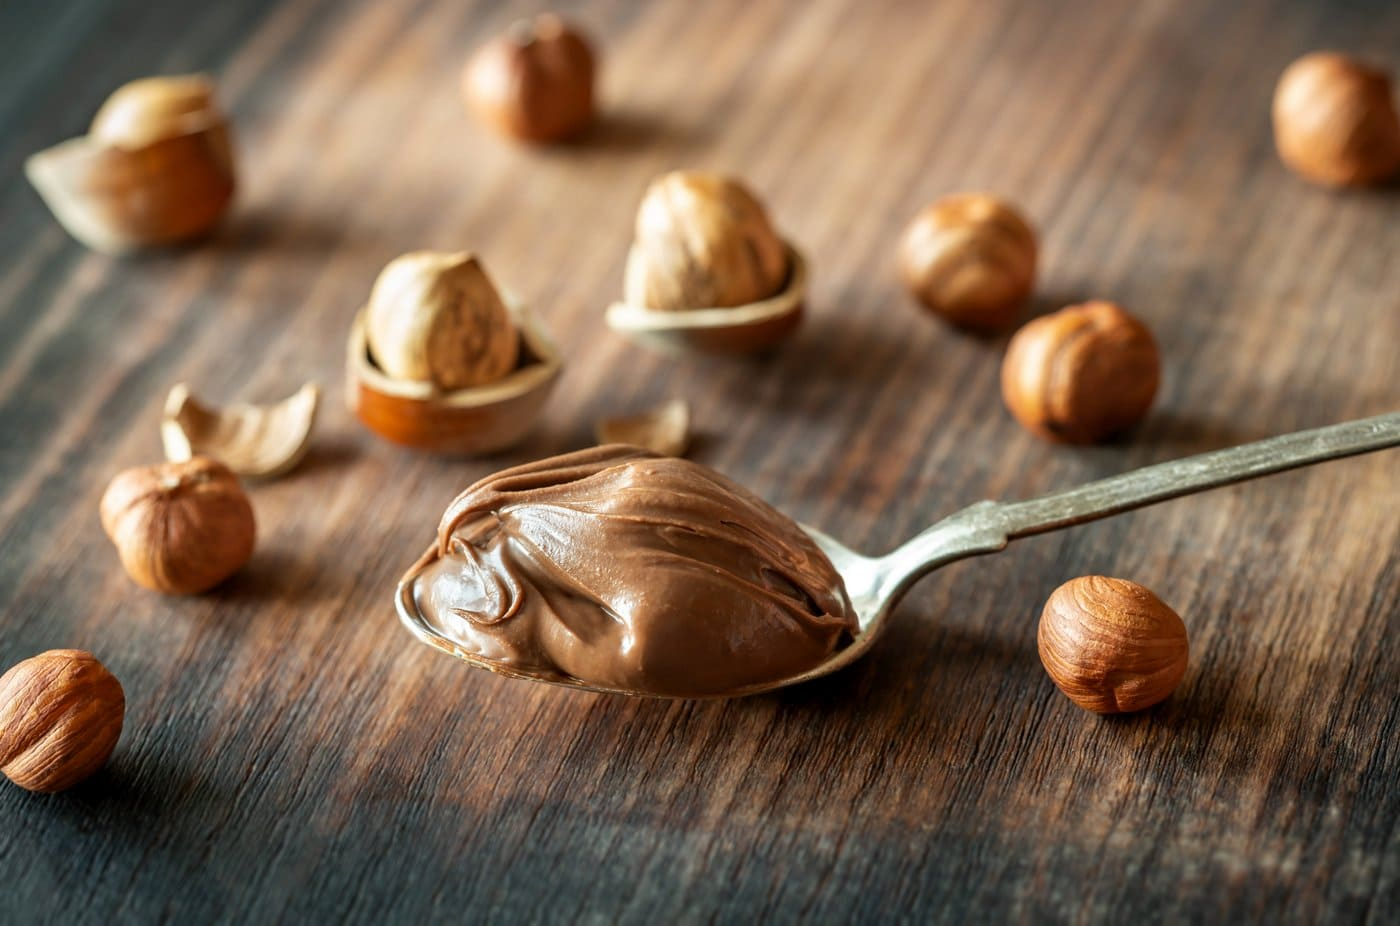 Hazelnuts and Nutella chocolate spread